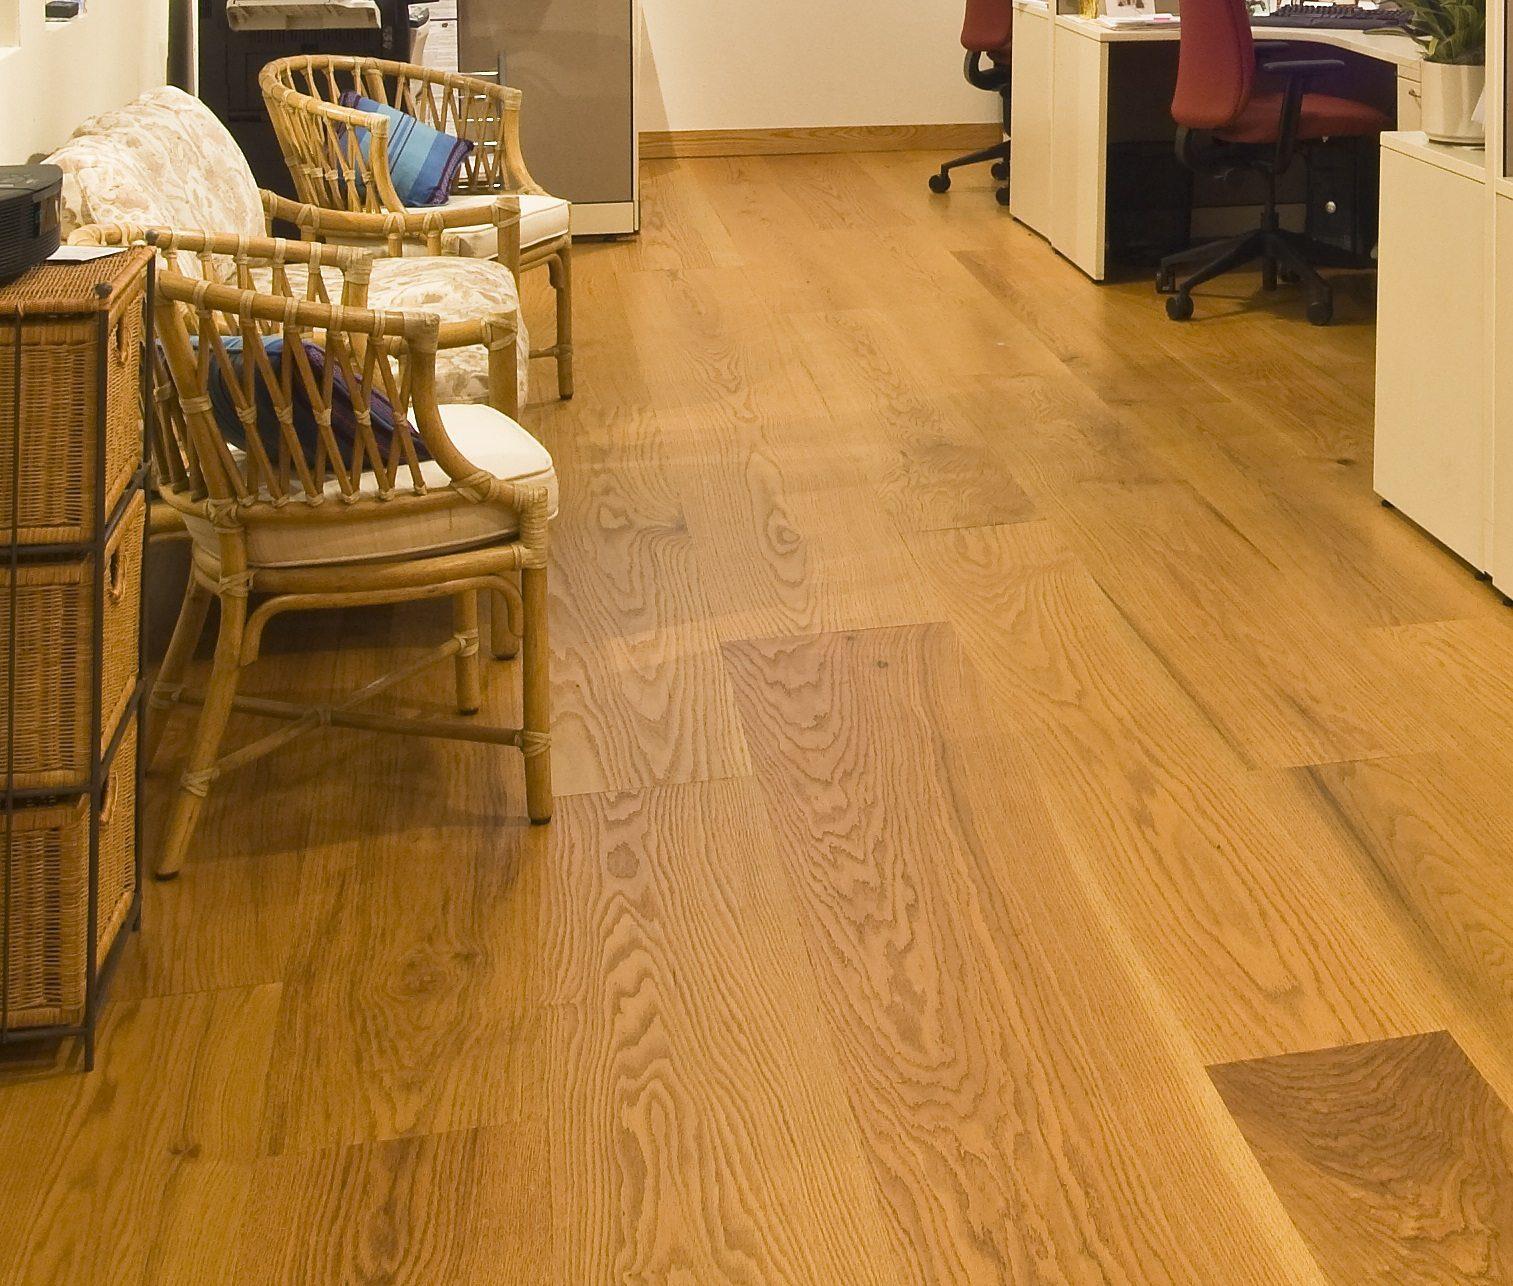 Red Oak Flooring In A Home Office Carlisle Wide Plank Floors